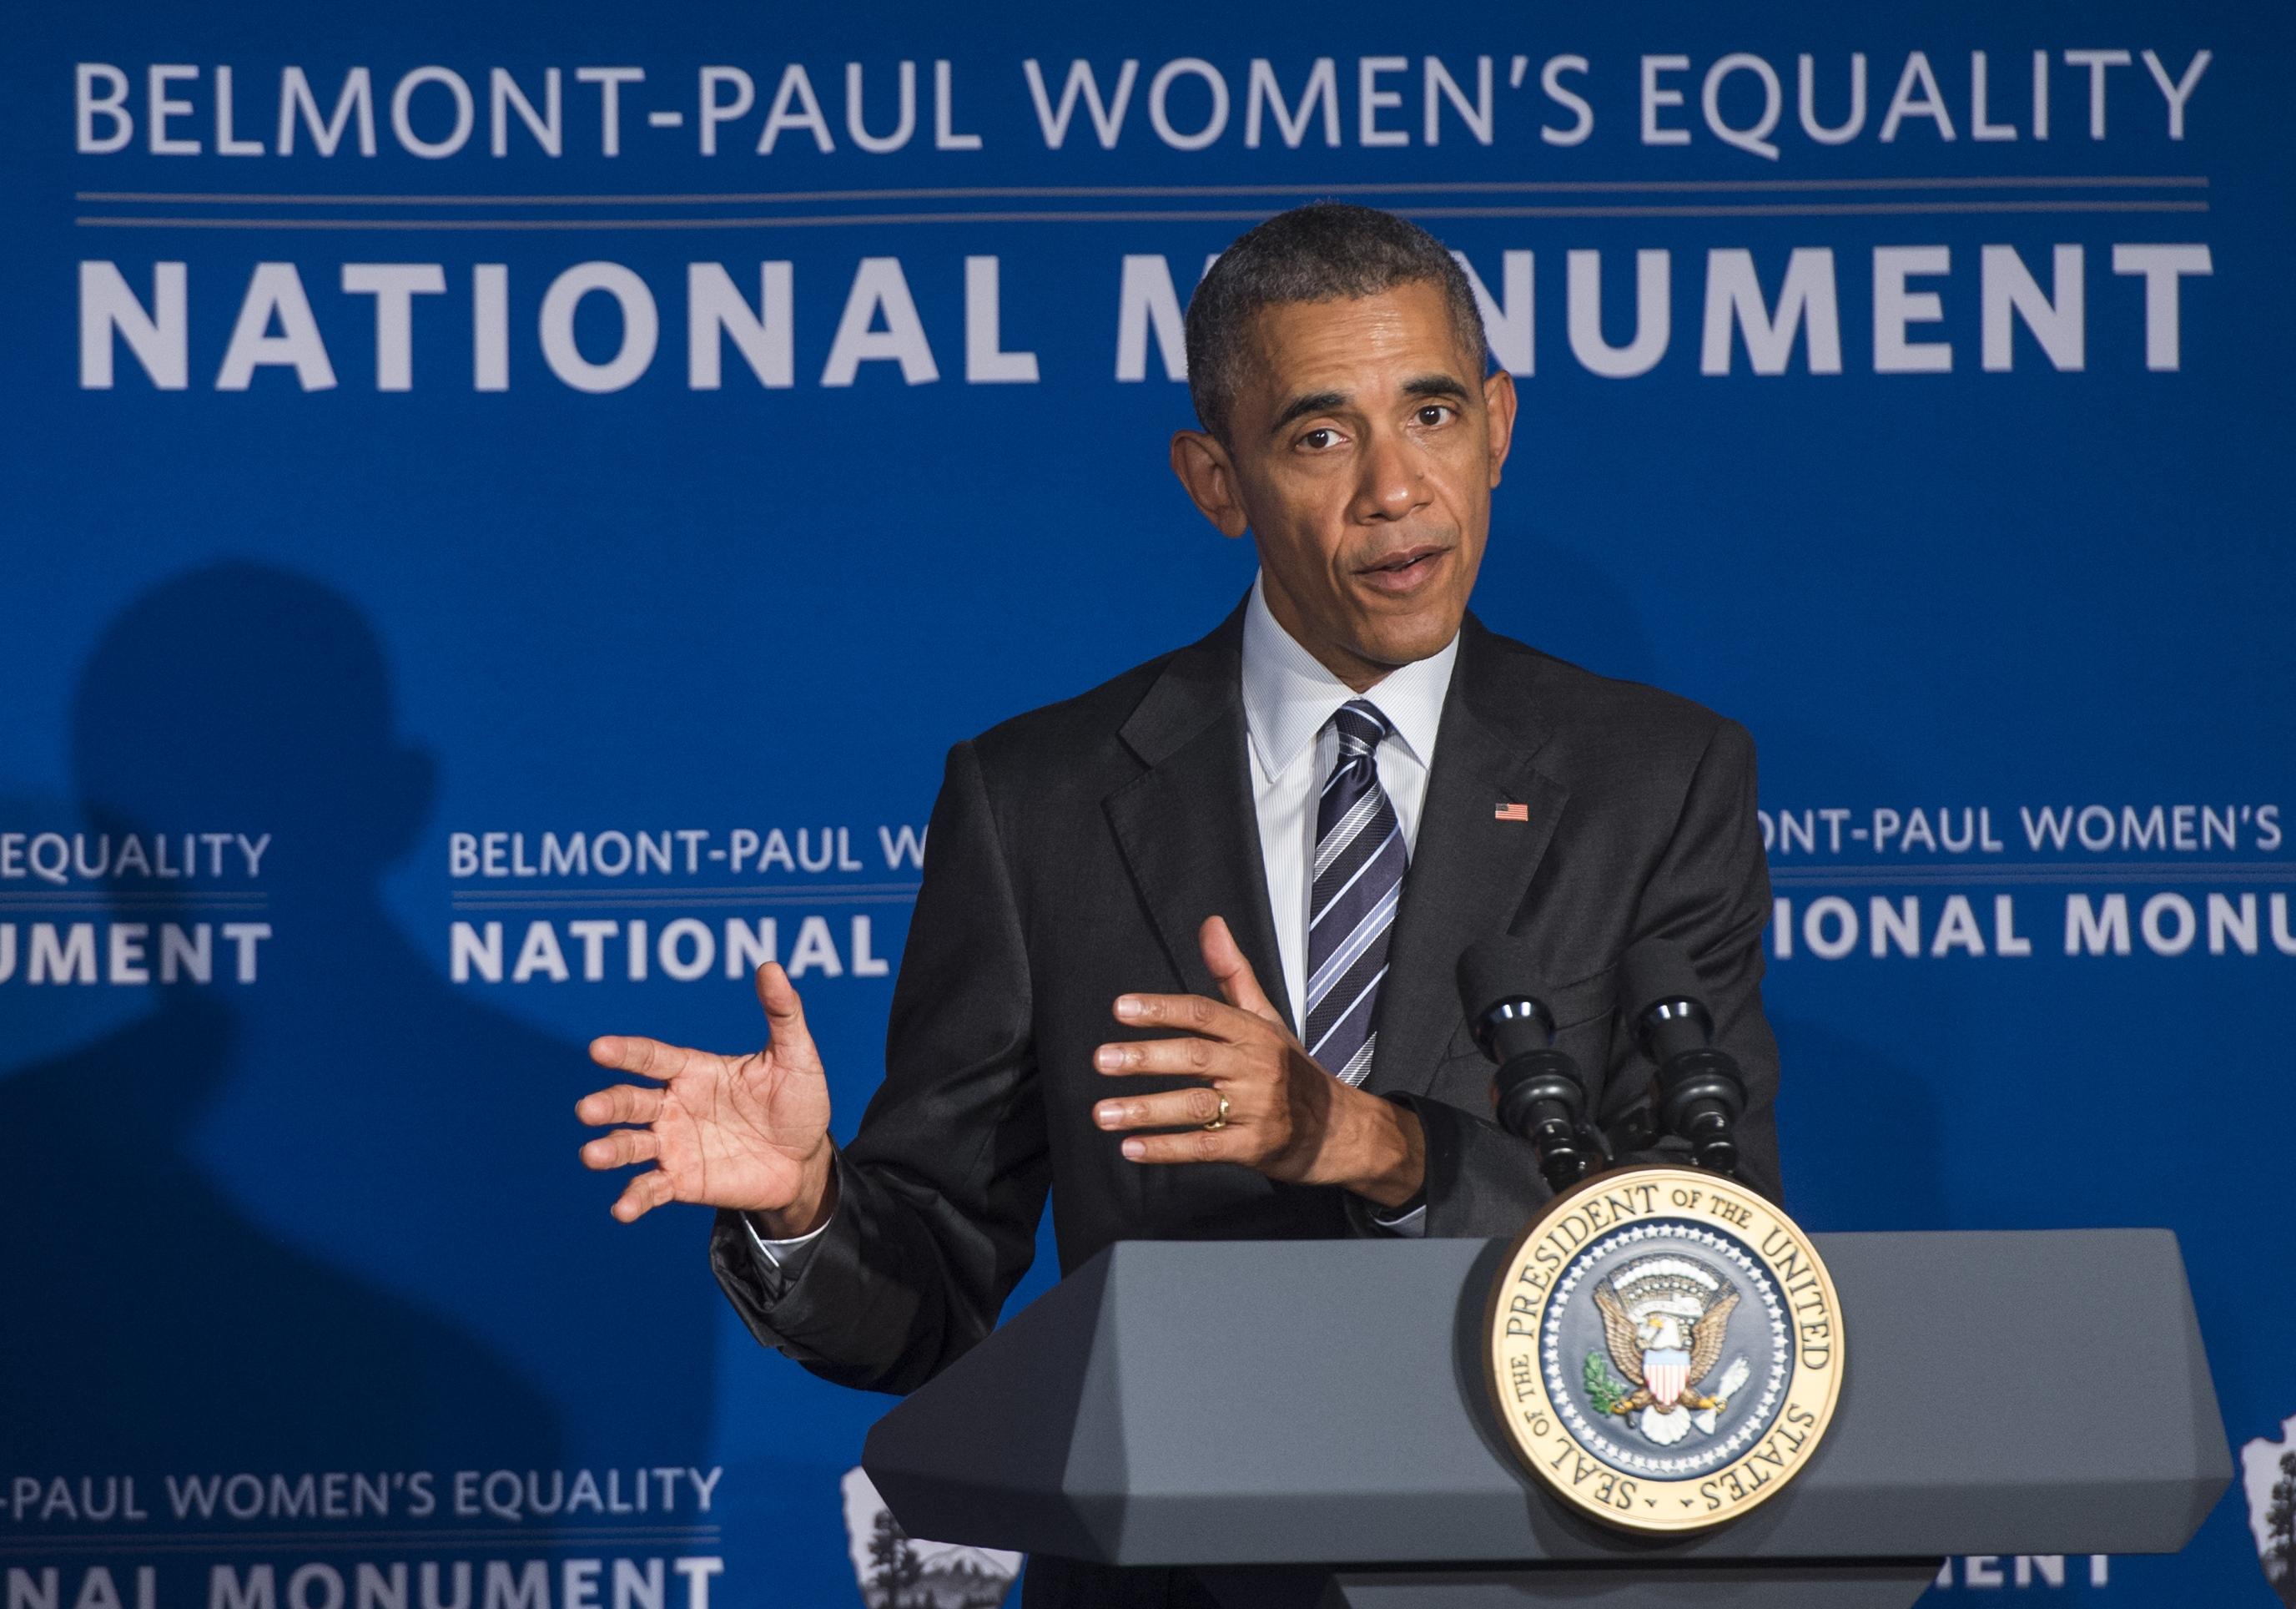 U.S. President Barack Obama speaks at the newly-designated Belmont-Paul Women's Equality National Monument in Washington, D.C. on April 12.